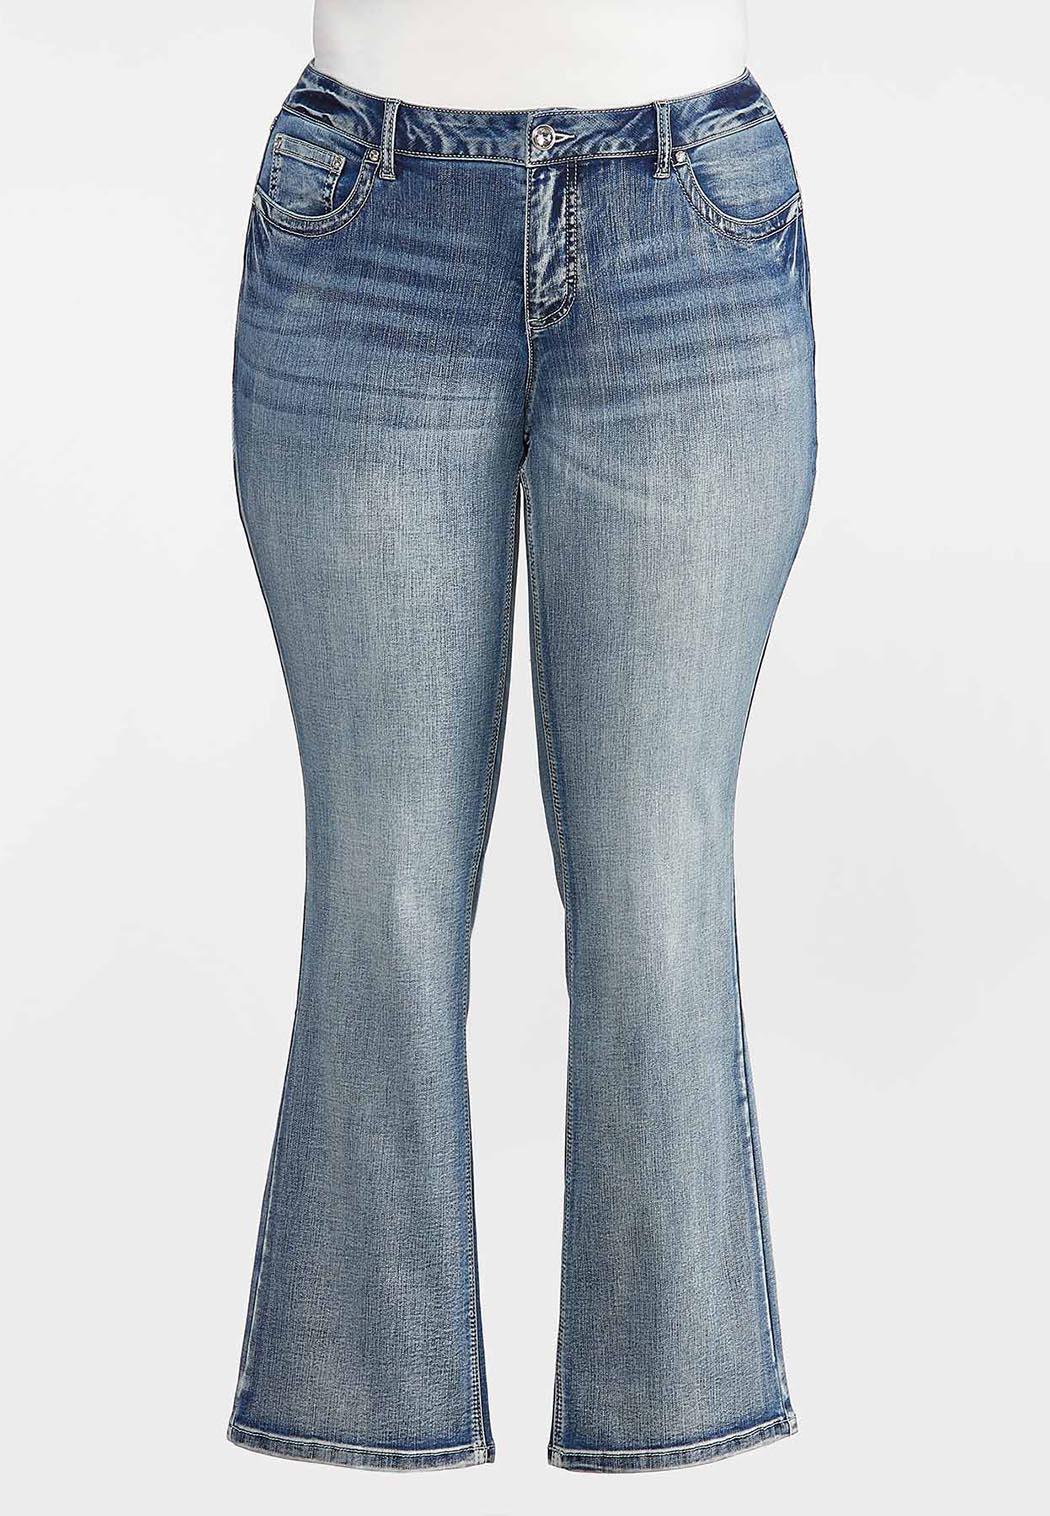 Plus Petite Fleur Di Lis Pocket Jeans (Item #44331924)